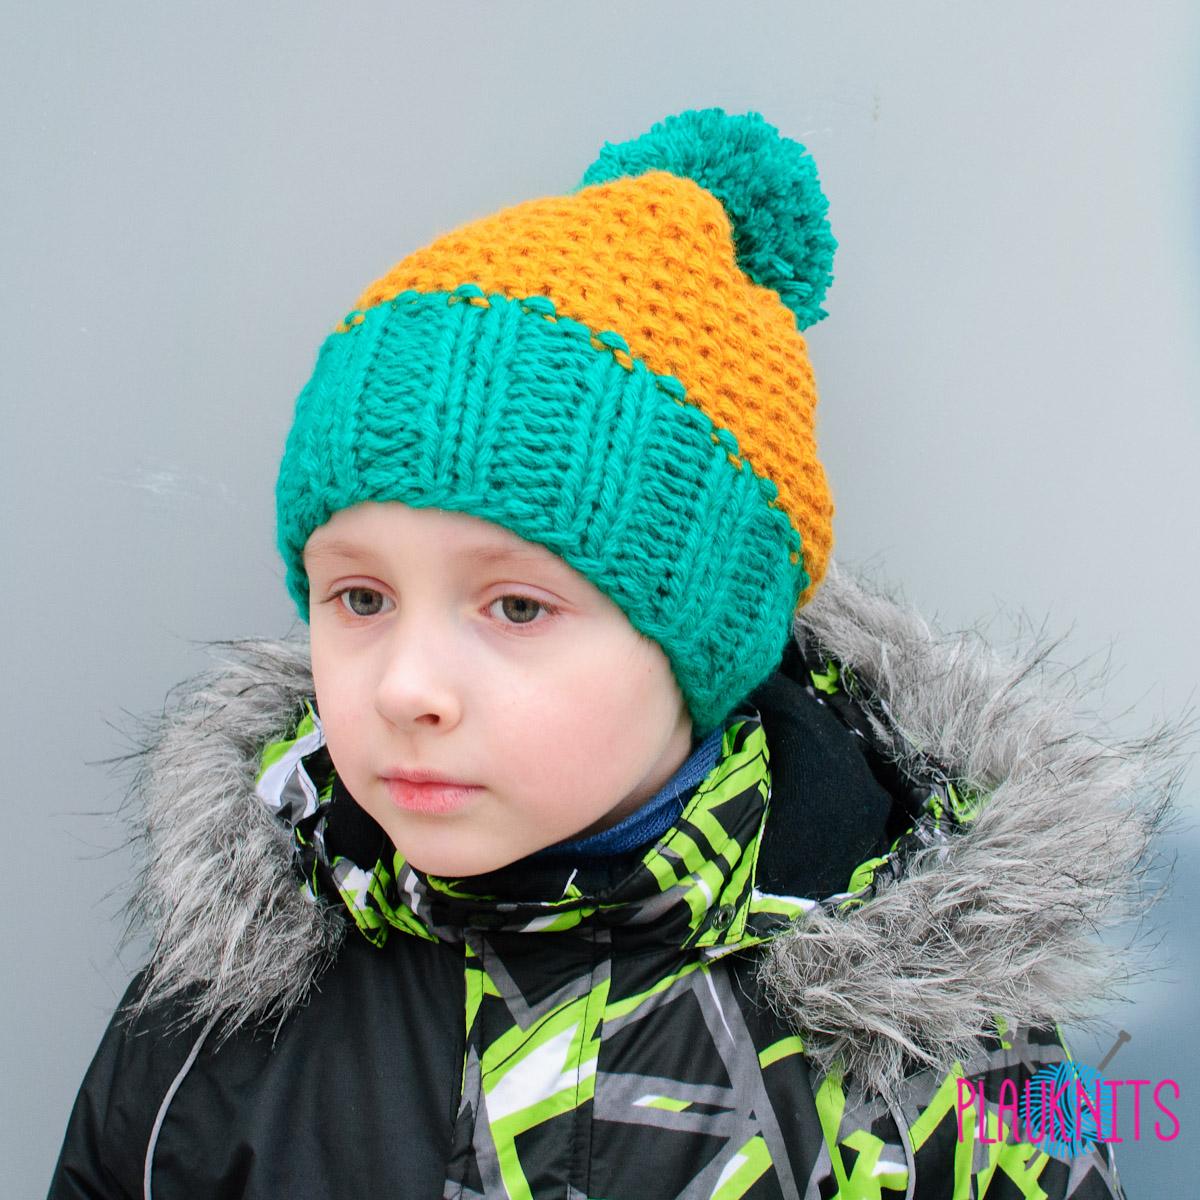 Жёлто-зелёная вязаная шапка с помпоном Квант